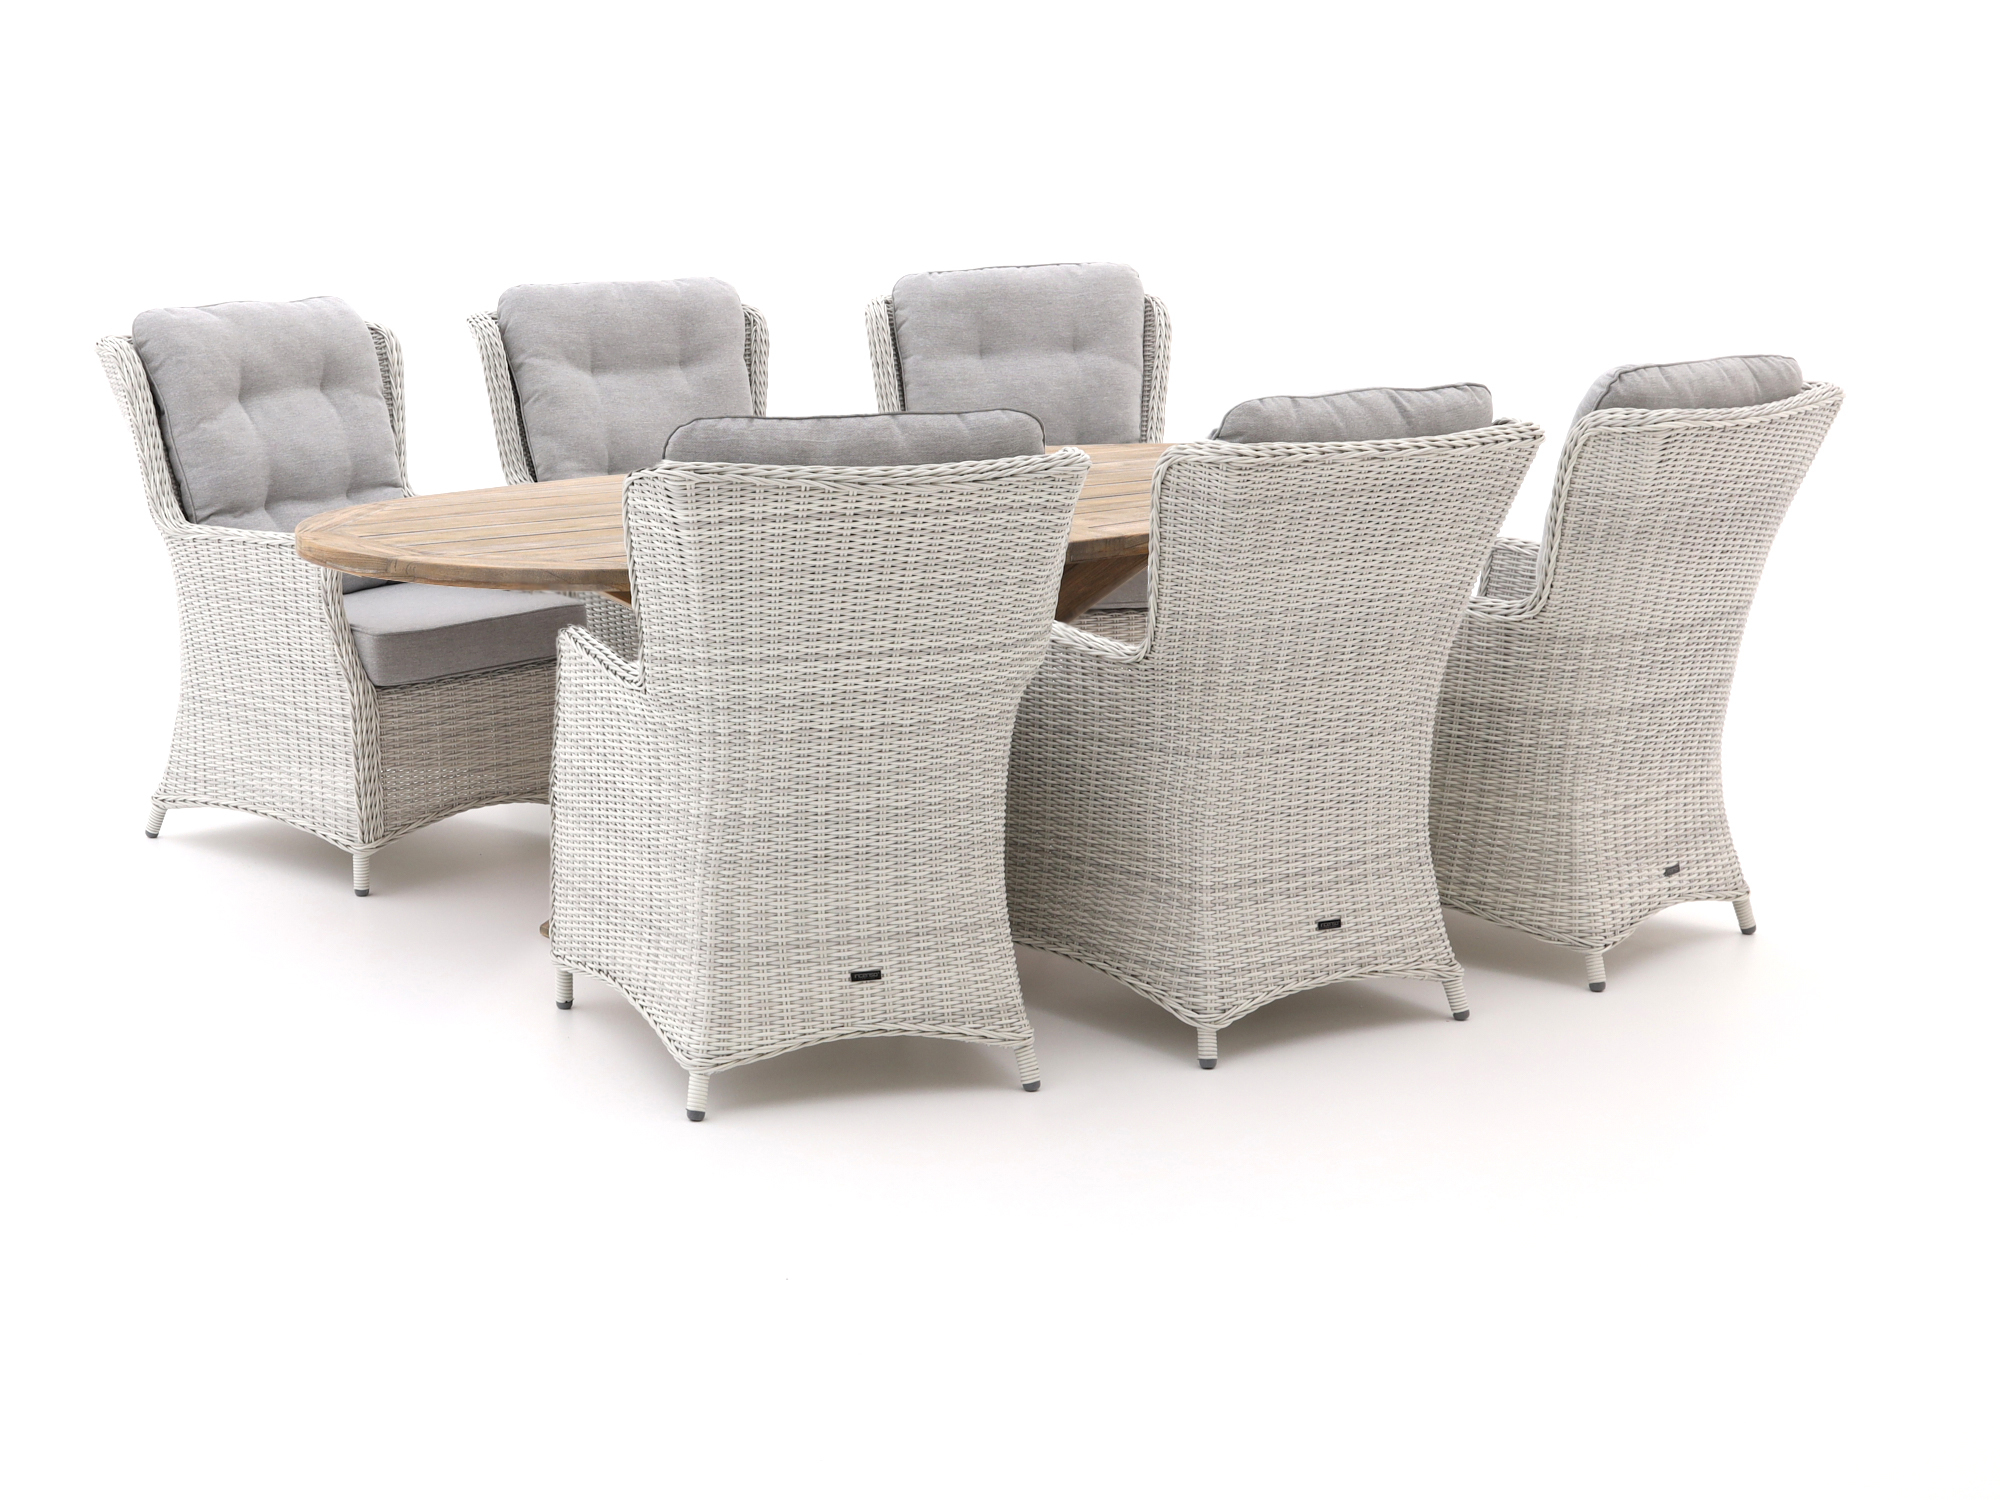 Intenso Milano/ROUGH-Y Ellips 240cm lounge-dining tuinset 7-delig - Laagste prijsgarantie!